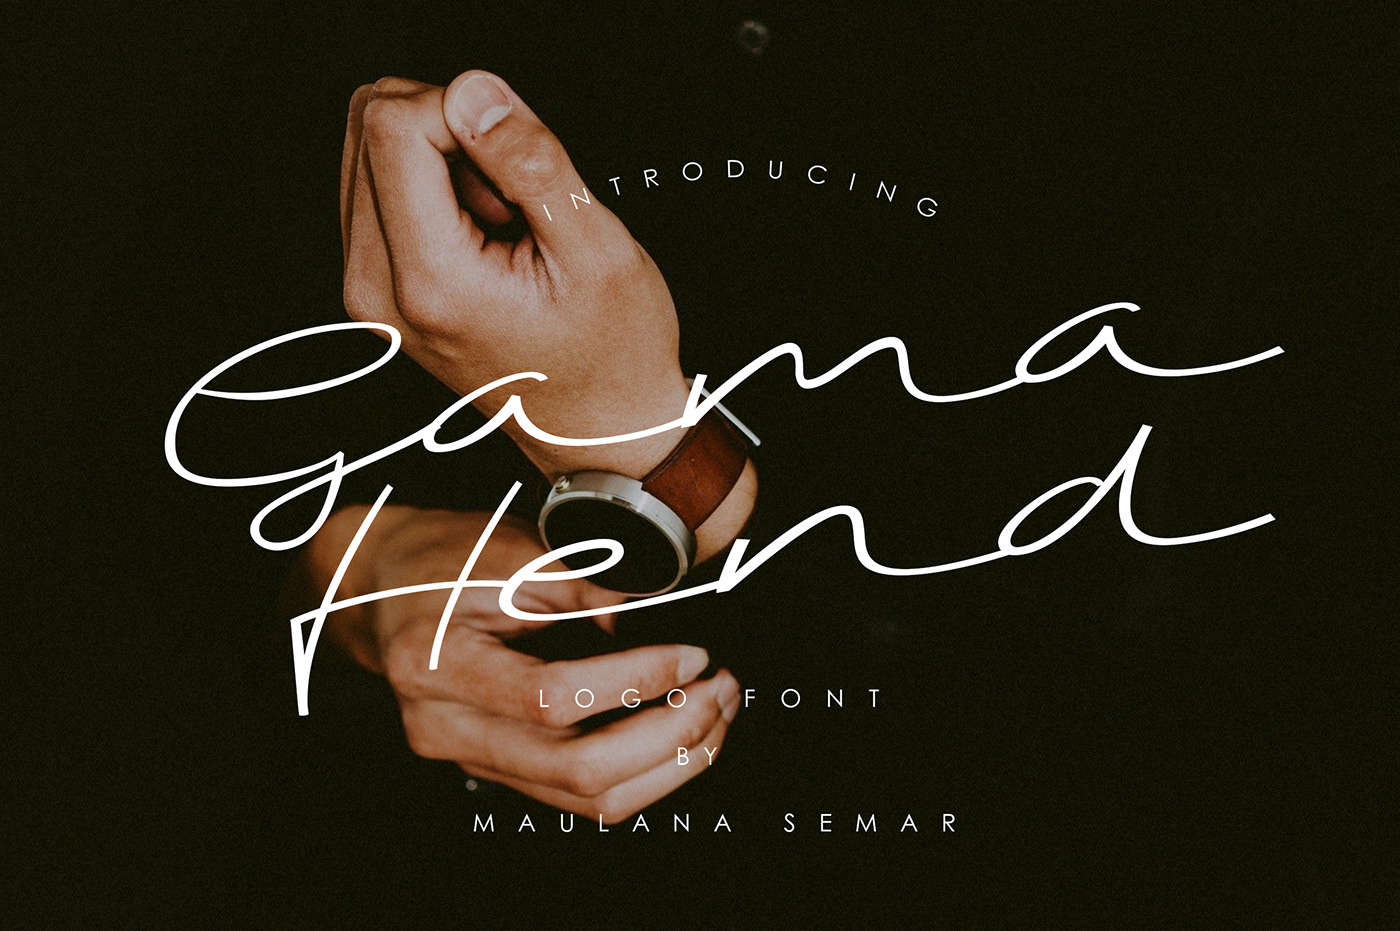 Free Download: Gama Hend Logo Font